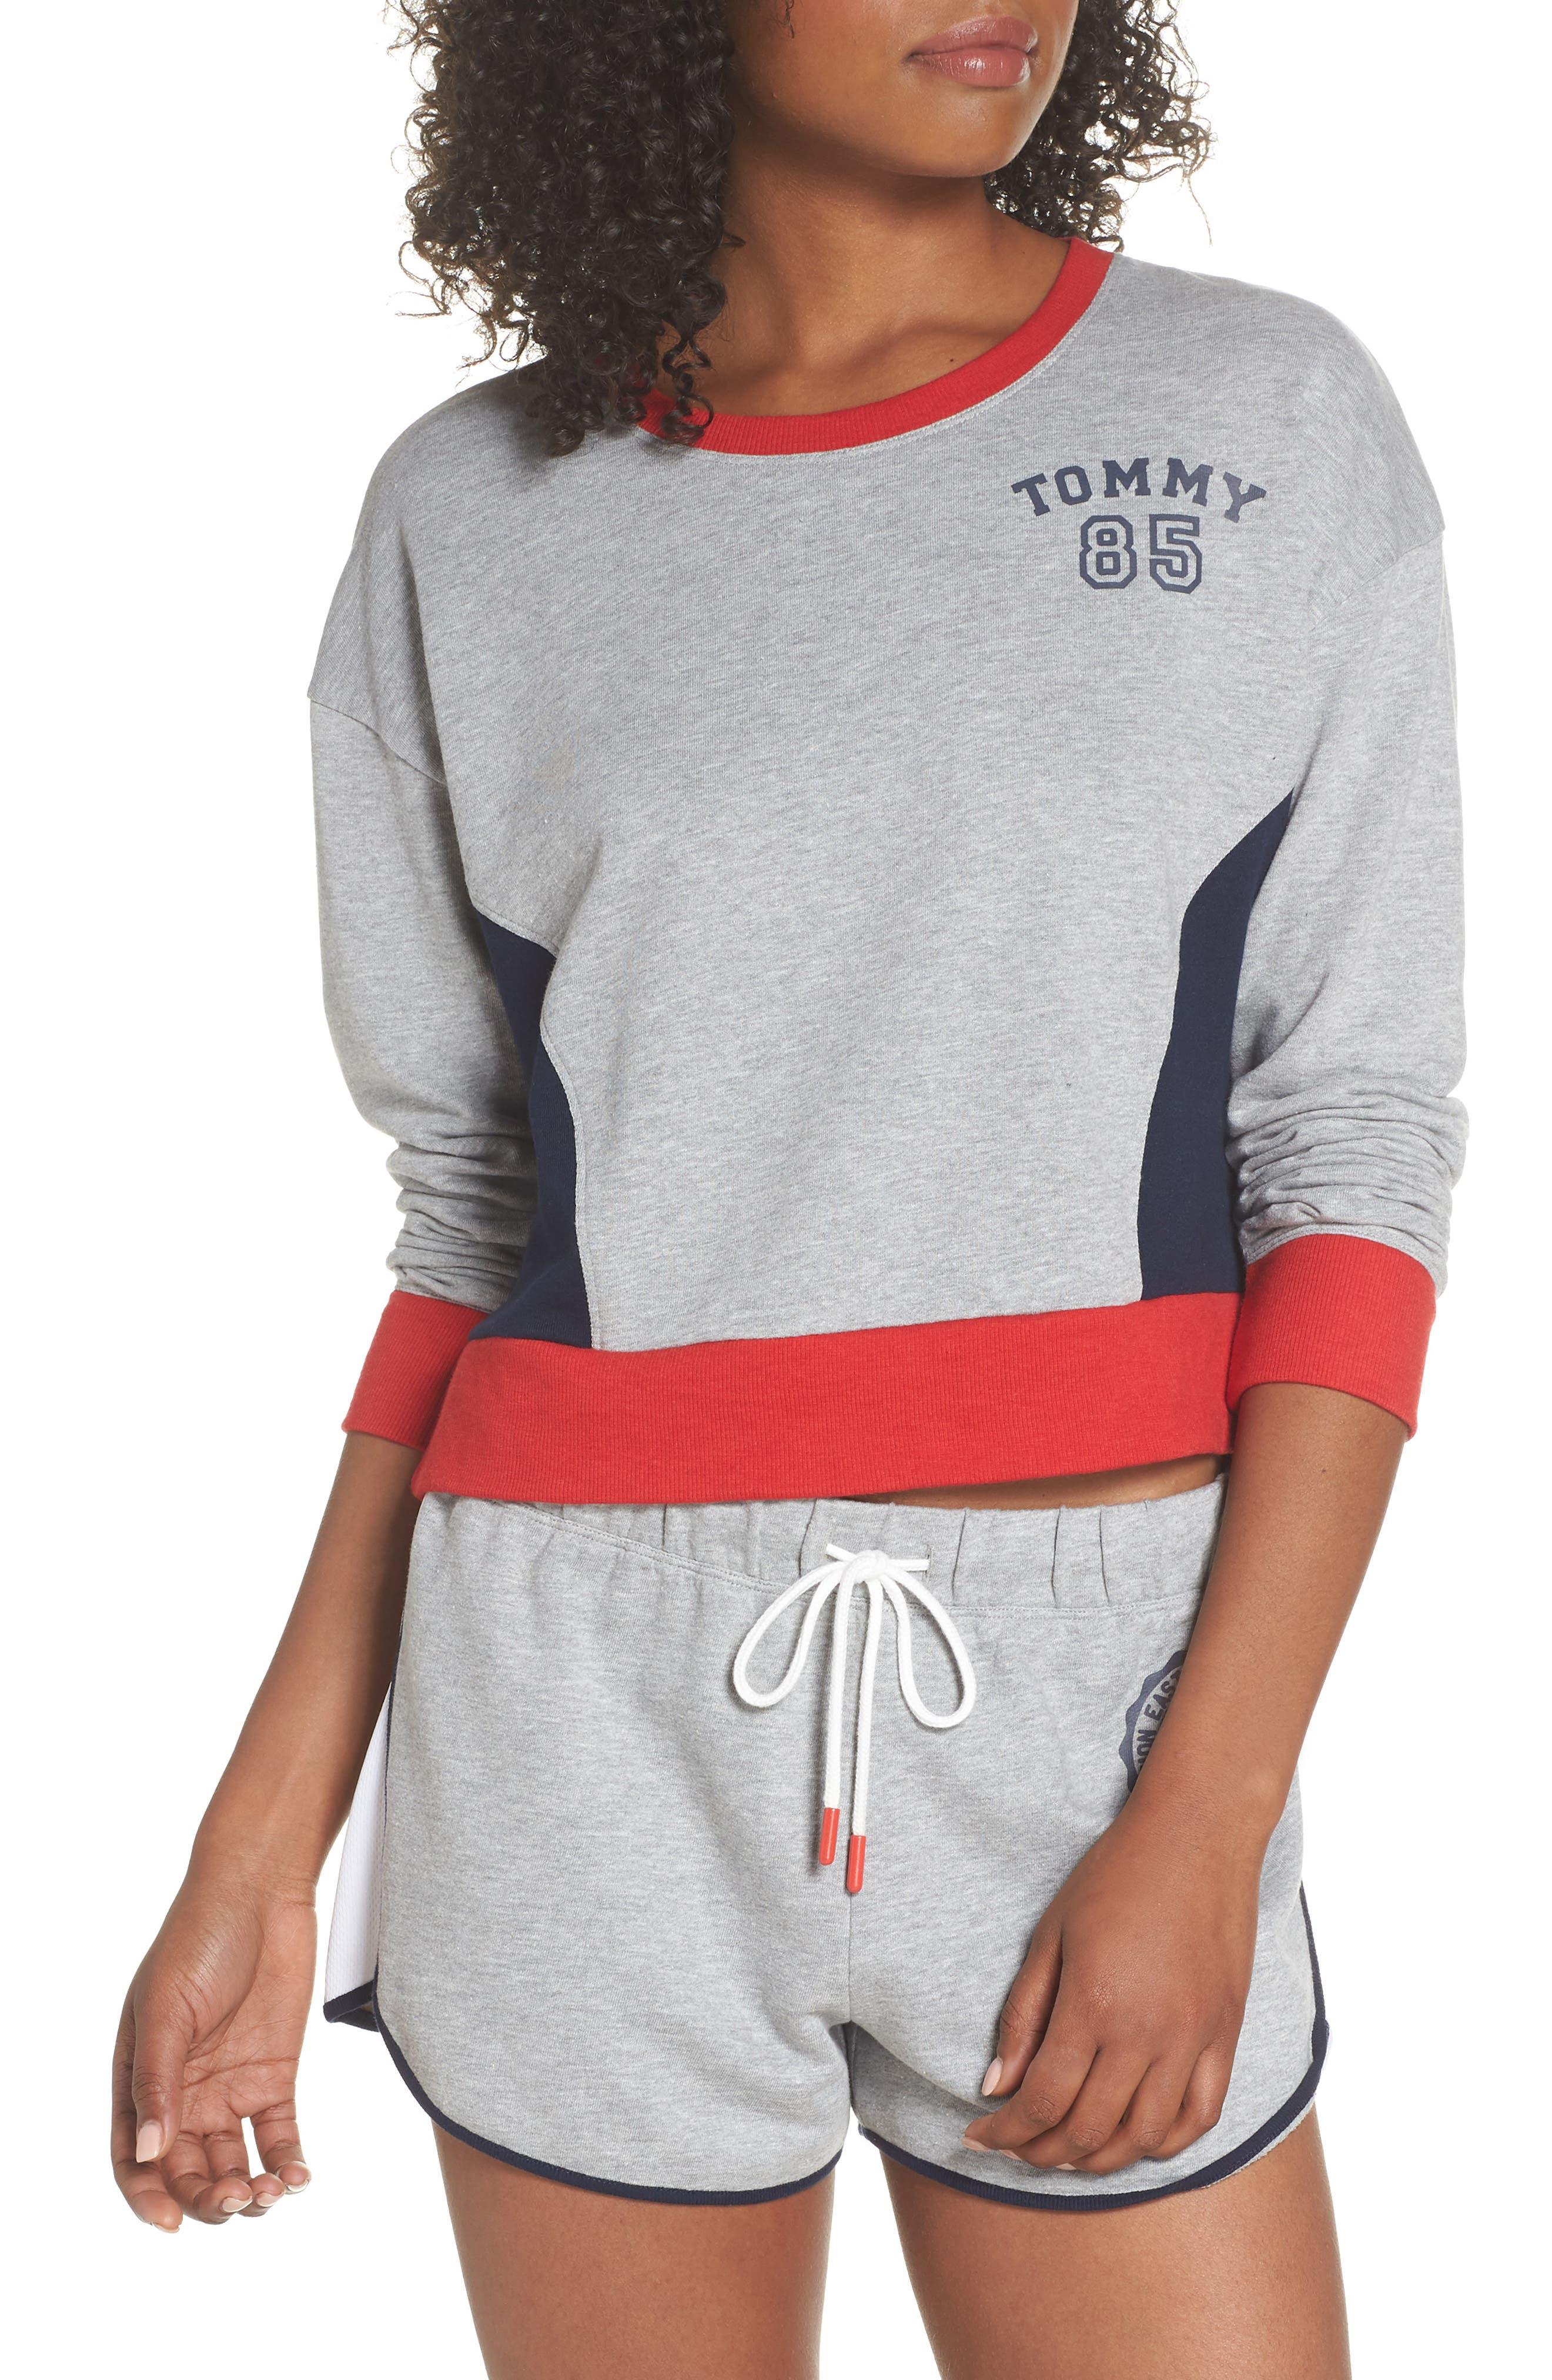 TOMMY HILFIGER Crop Lounge Sweatshirt, Main, color, 025